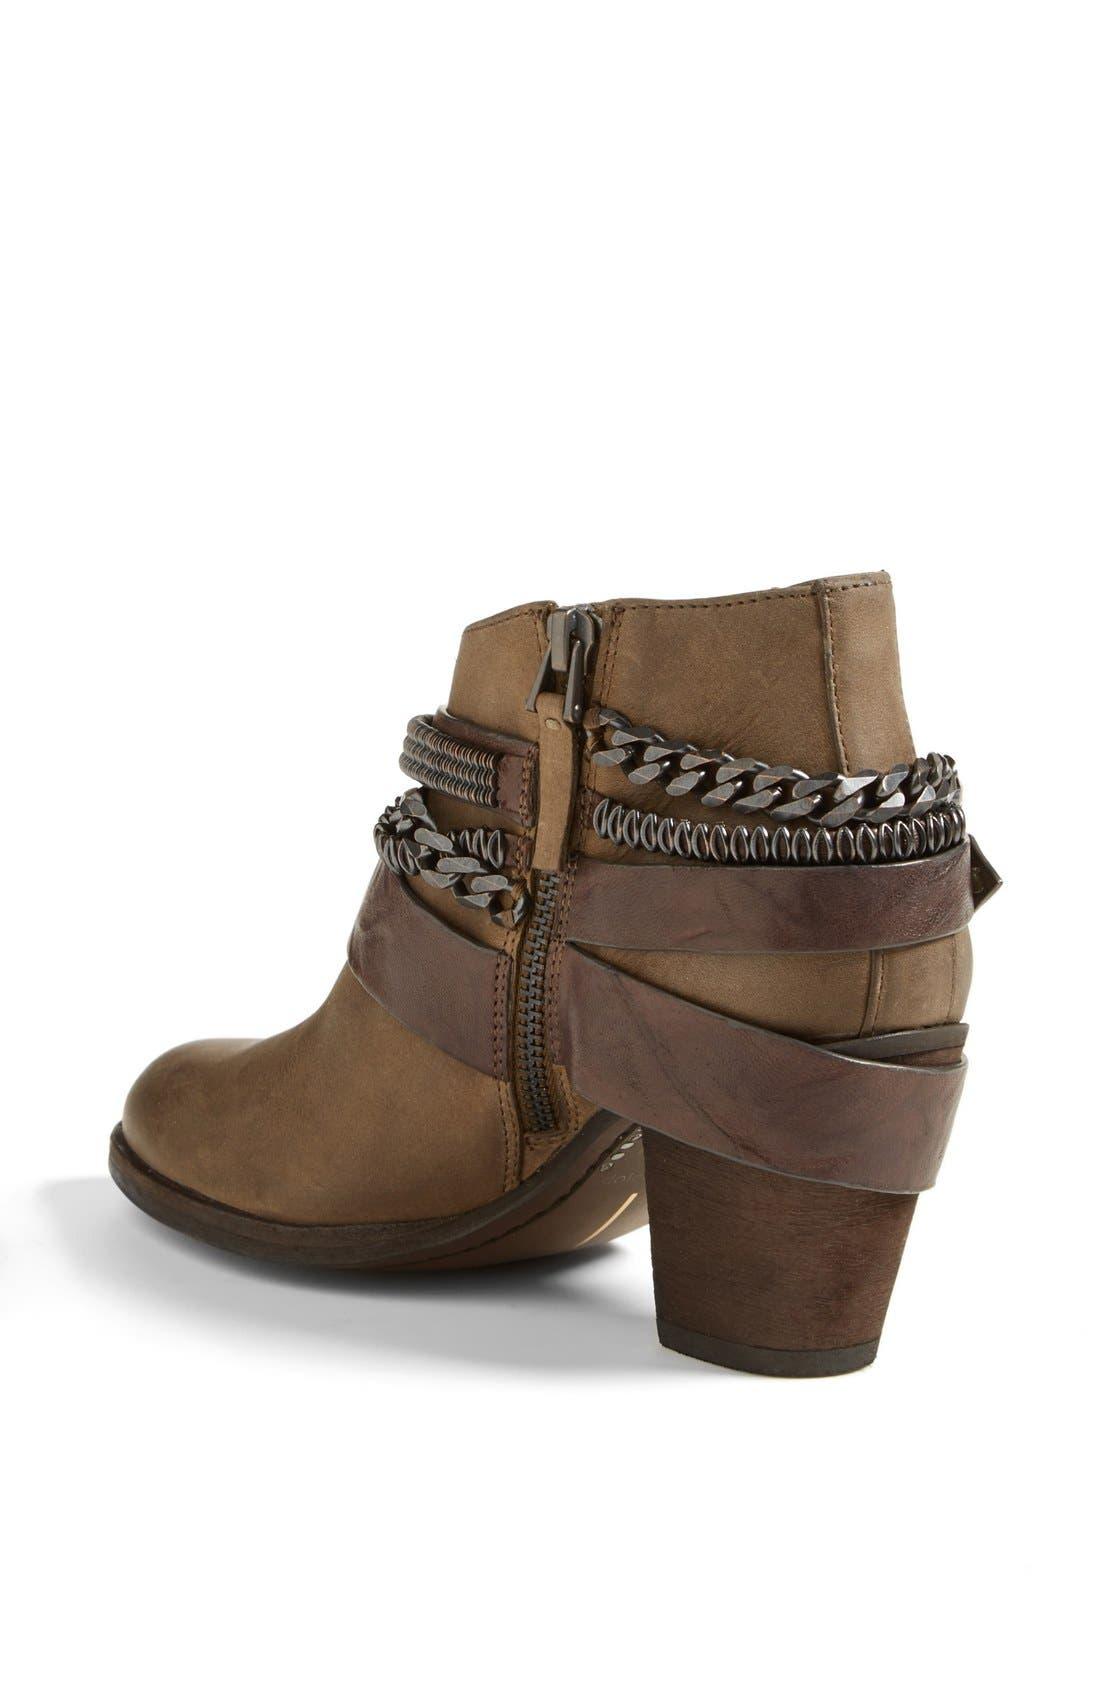 Alternate Image 2  - Dolce Vita 'Yazmina' Leather Bootie (Women)